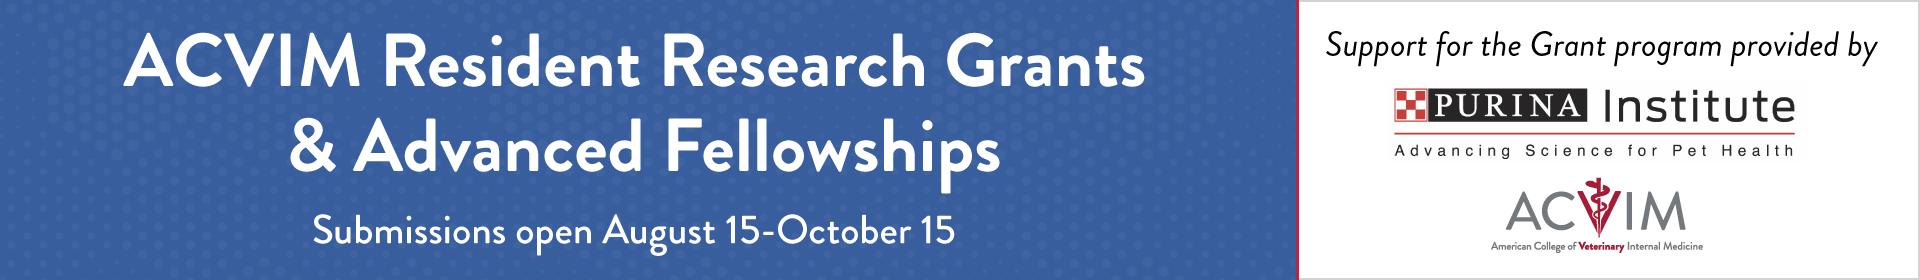 2020 Grants & Fellowships Scorecard Event Banner